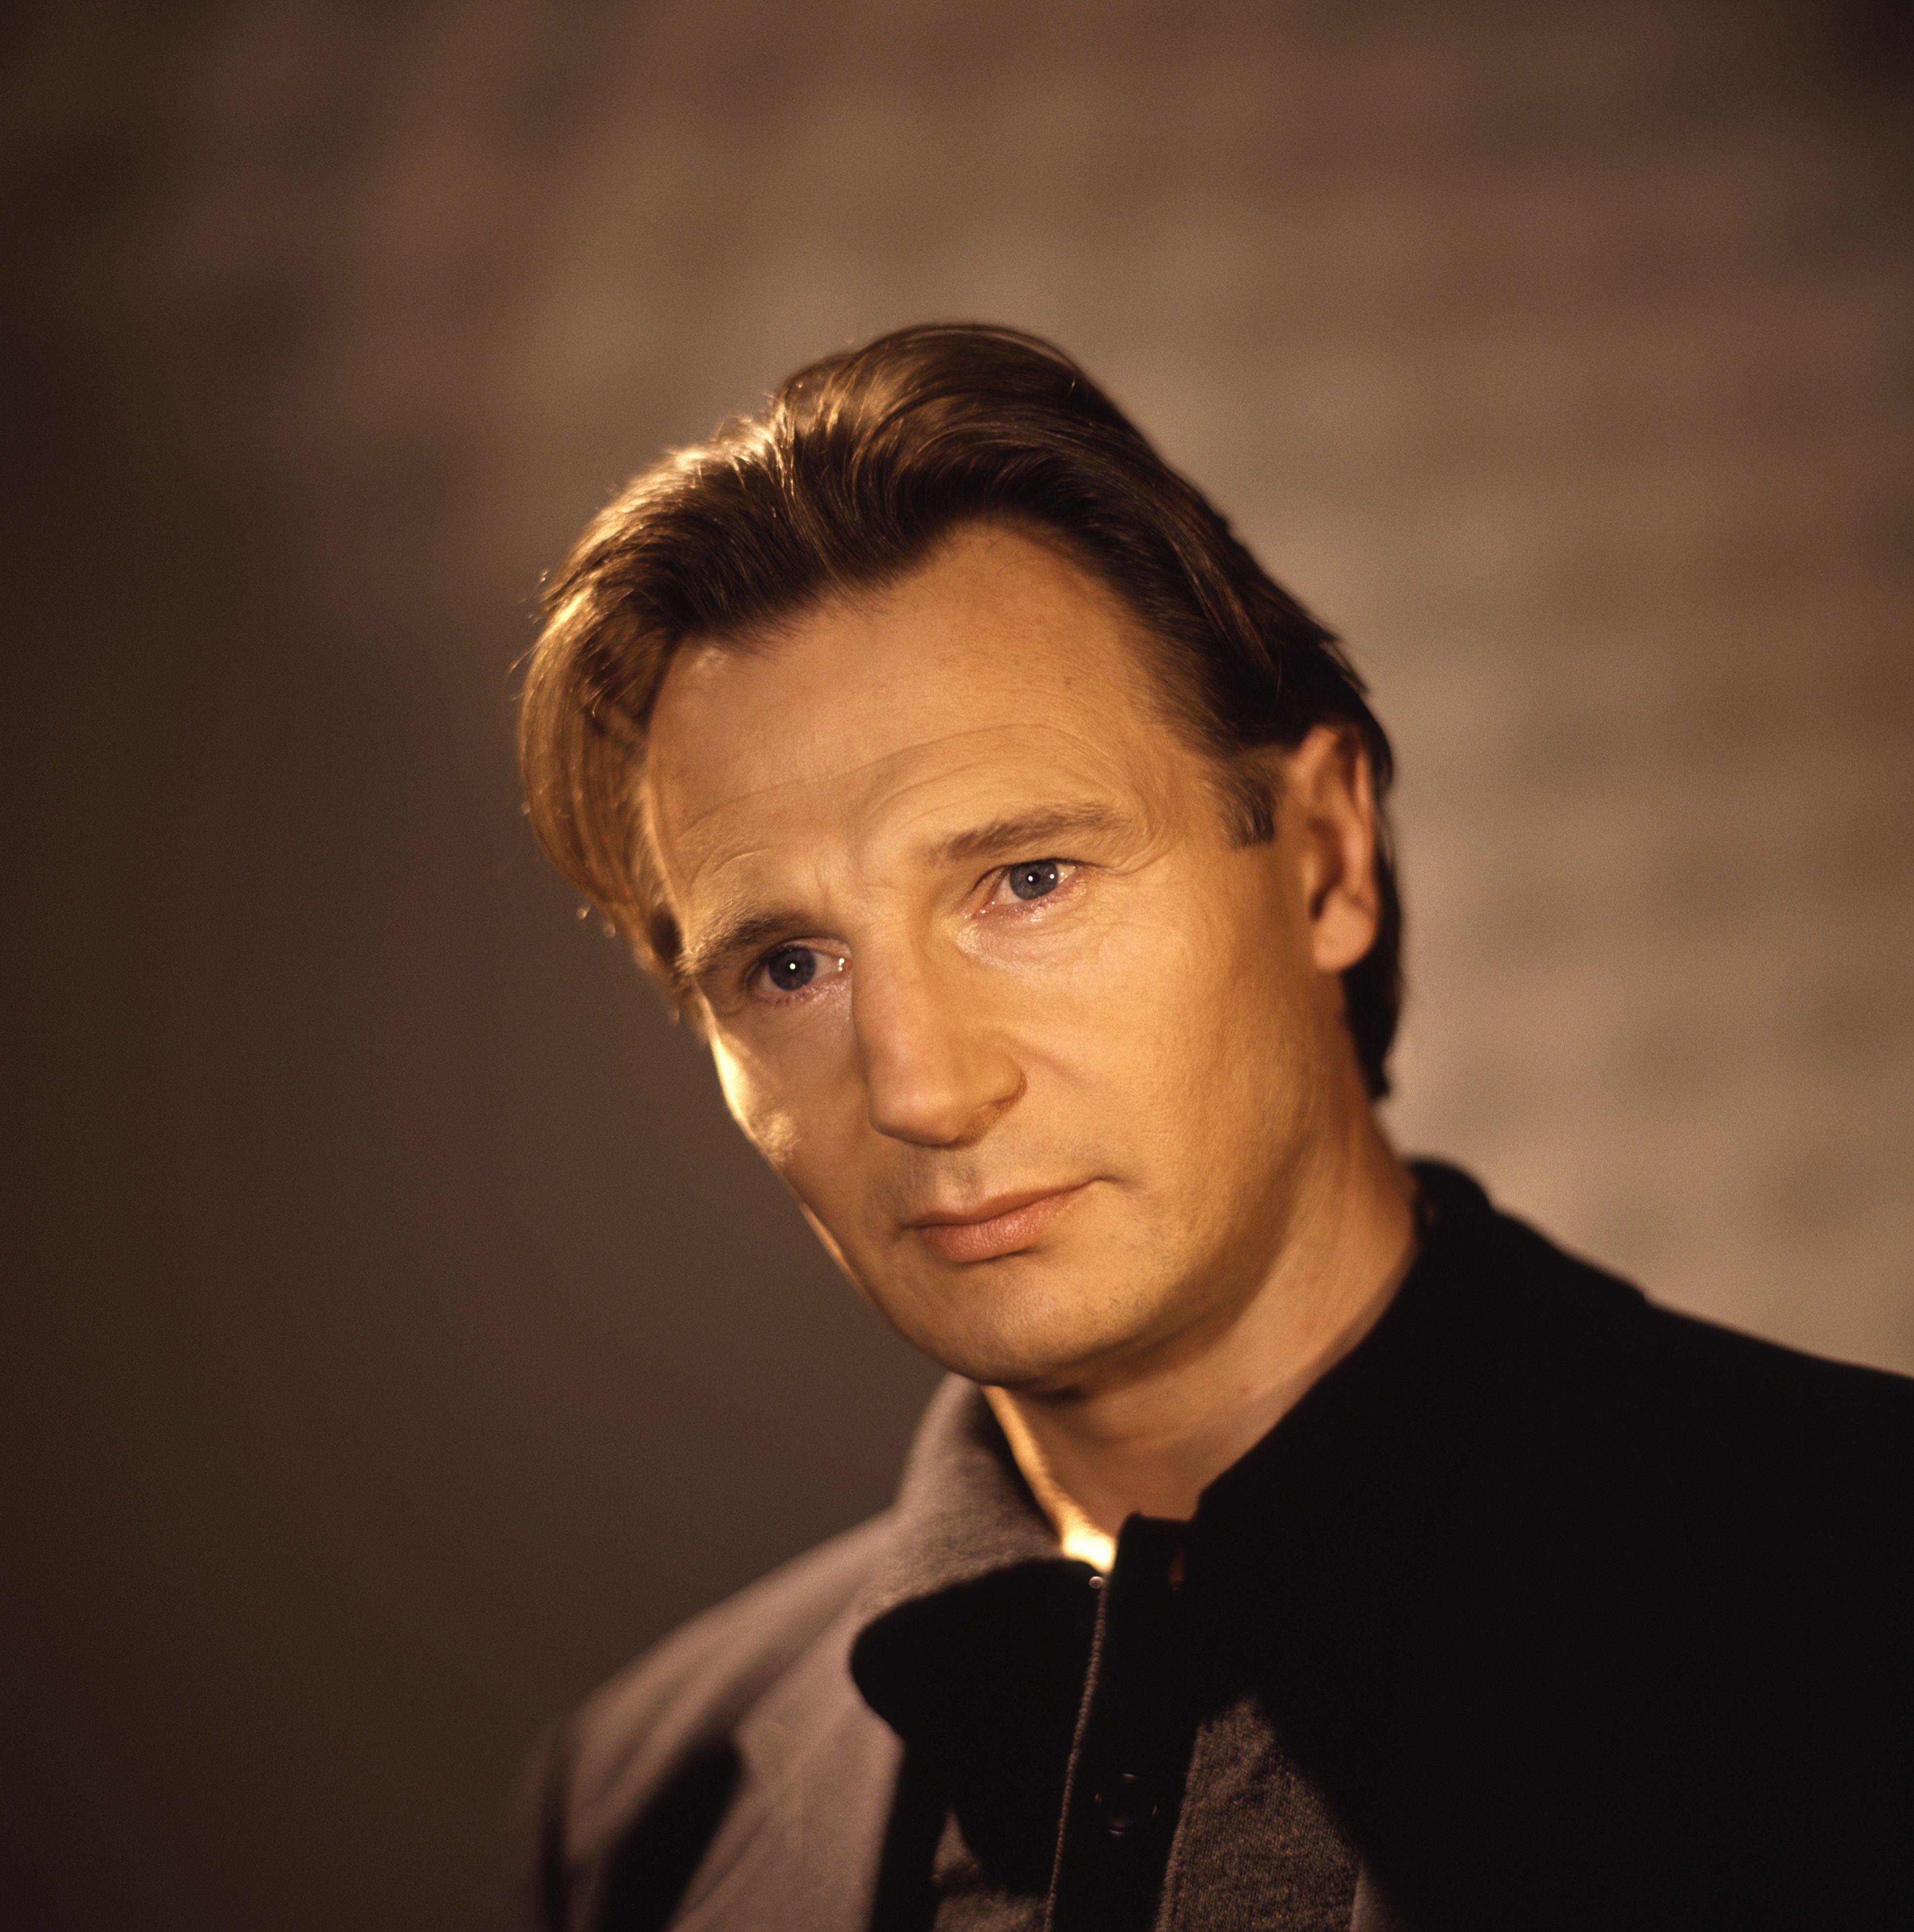 Liam Neeson - Photos